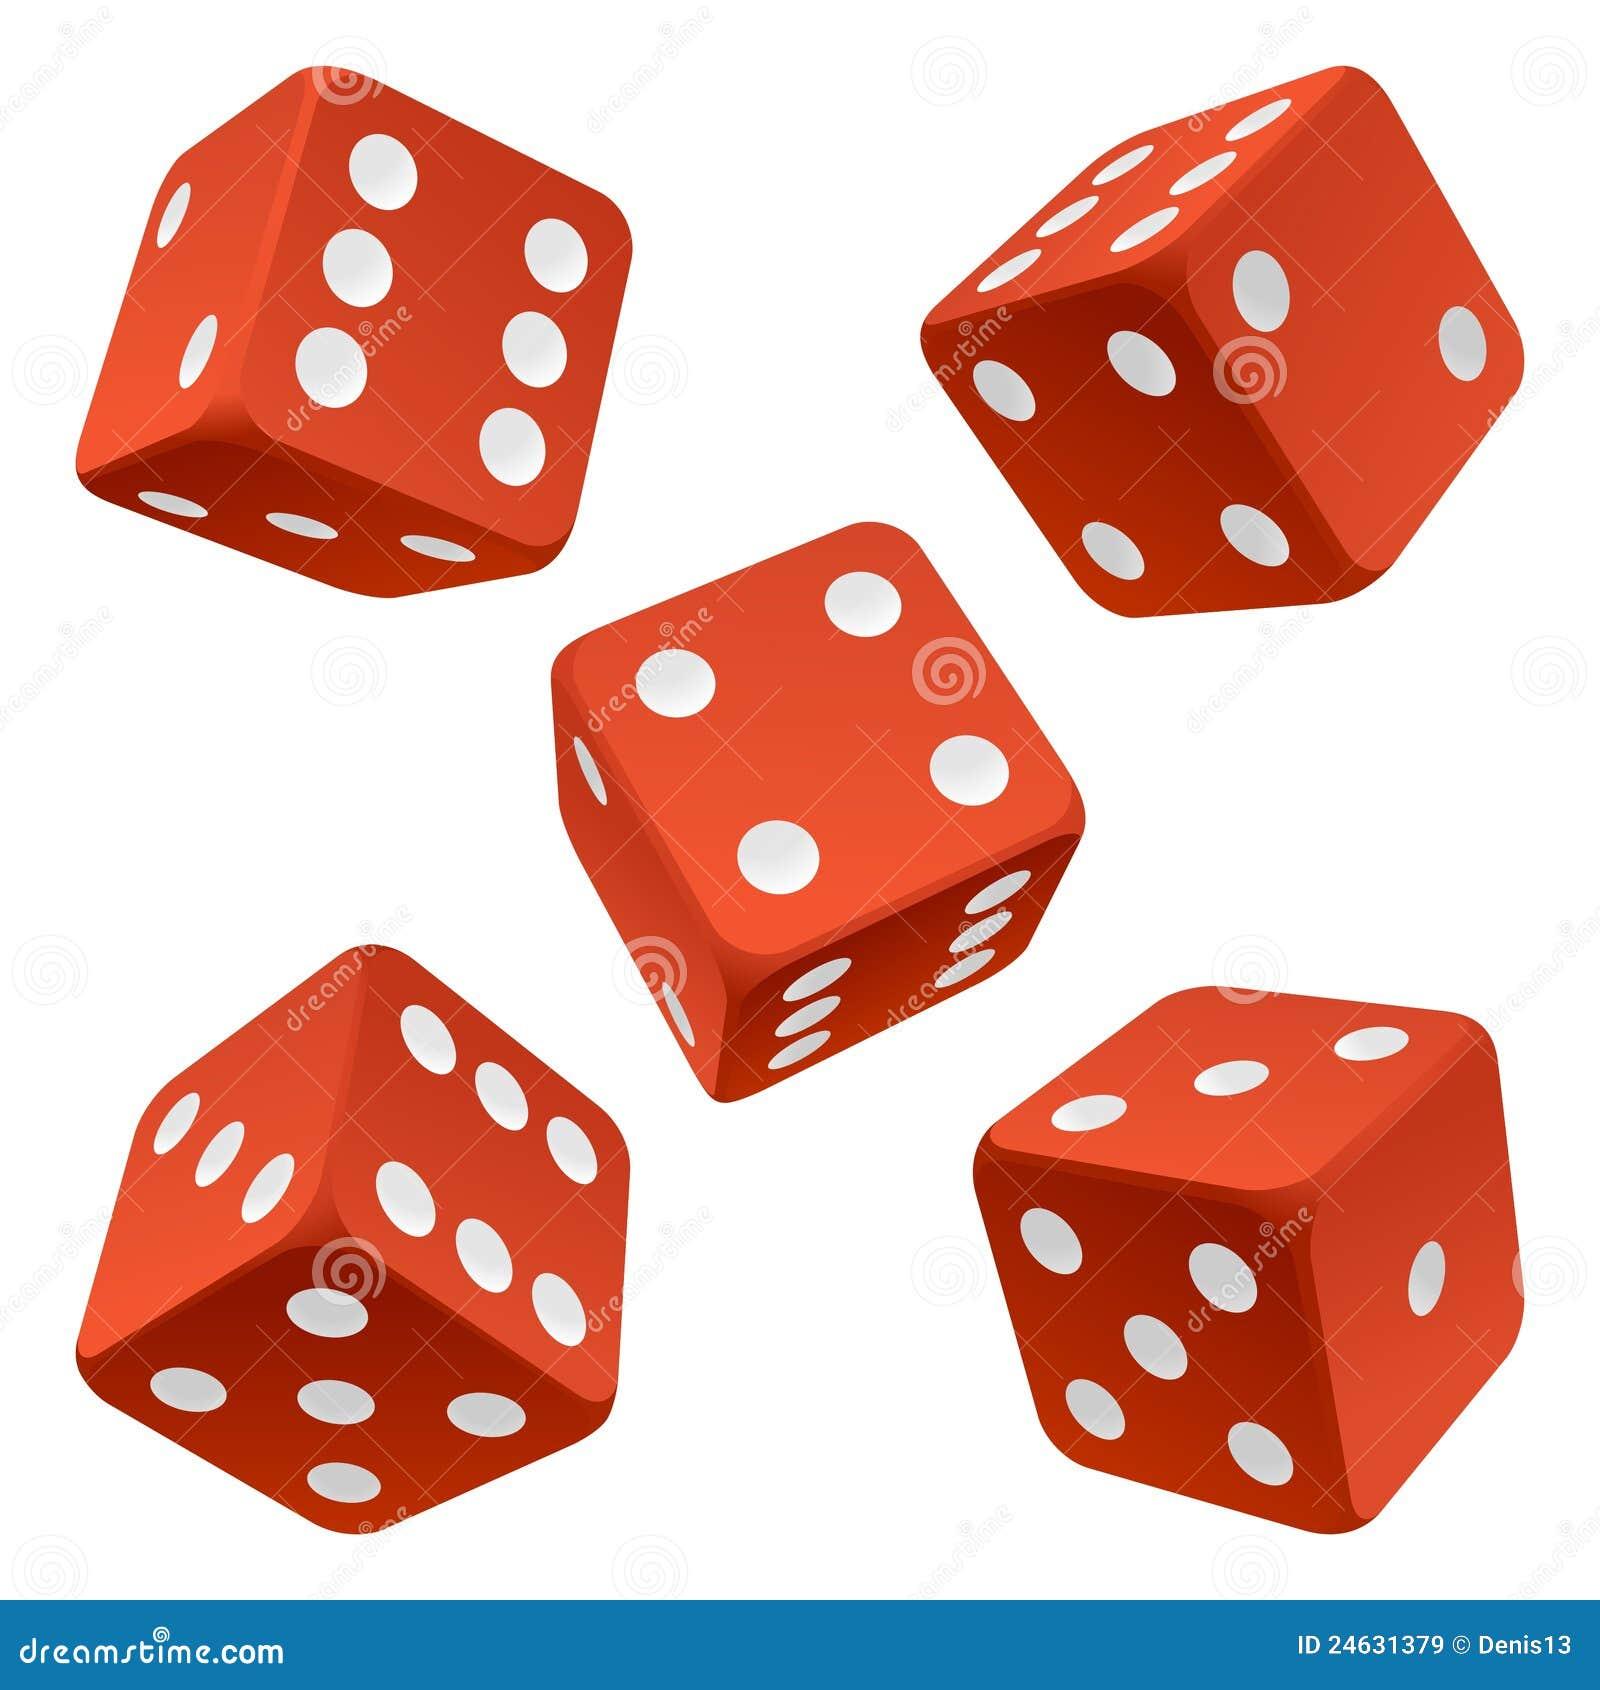 online casino dice roll online